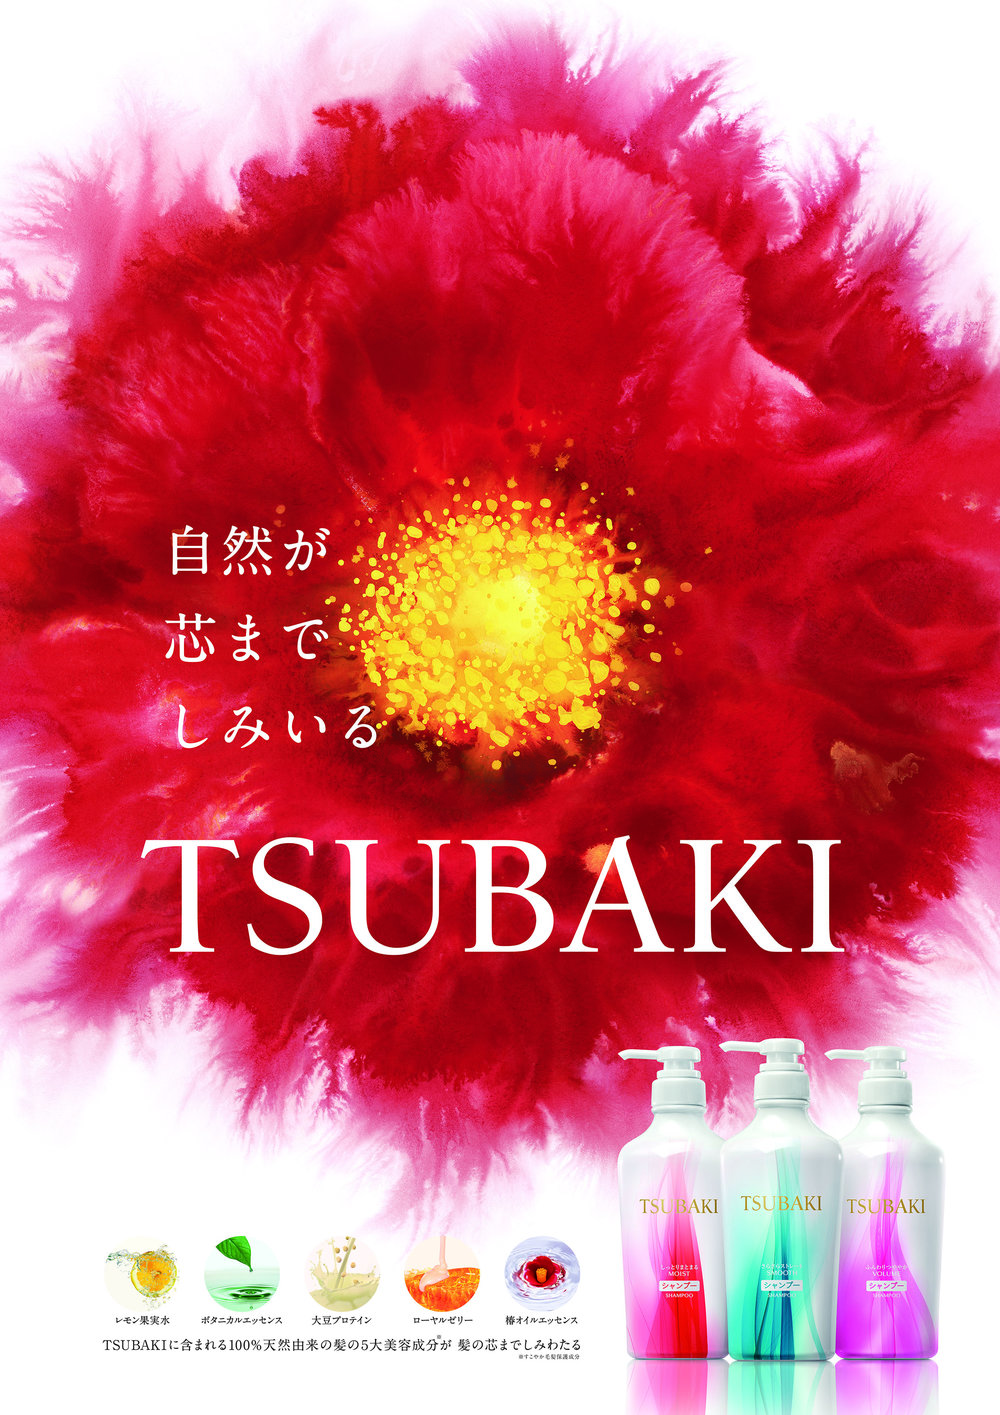 TBK_B1_2_180308.jpg